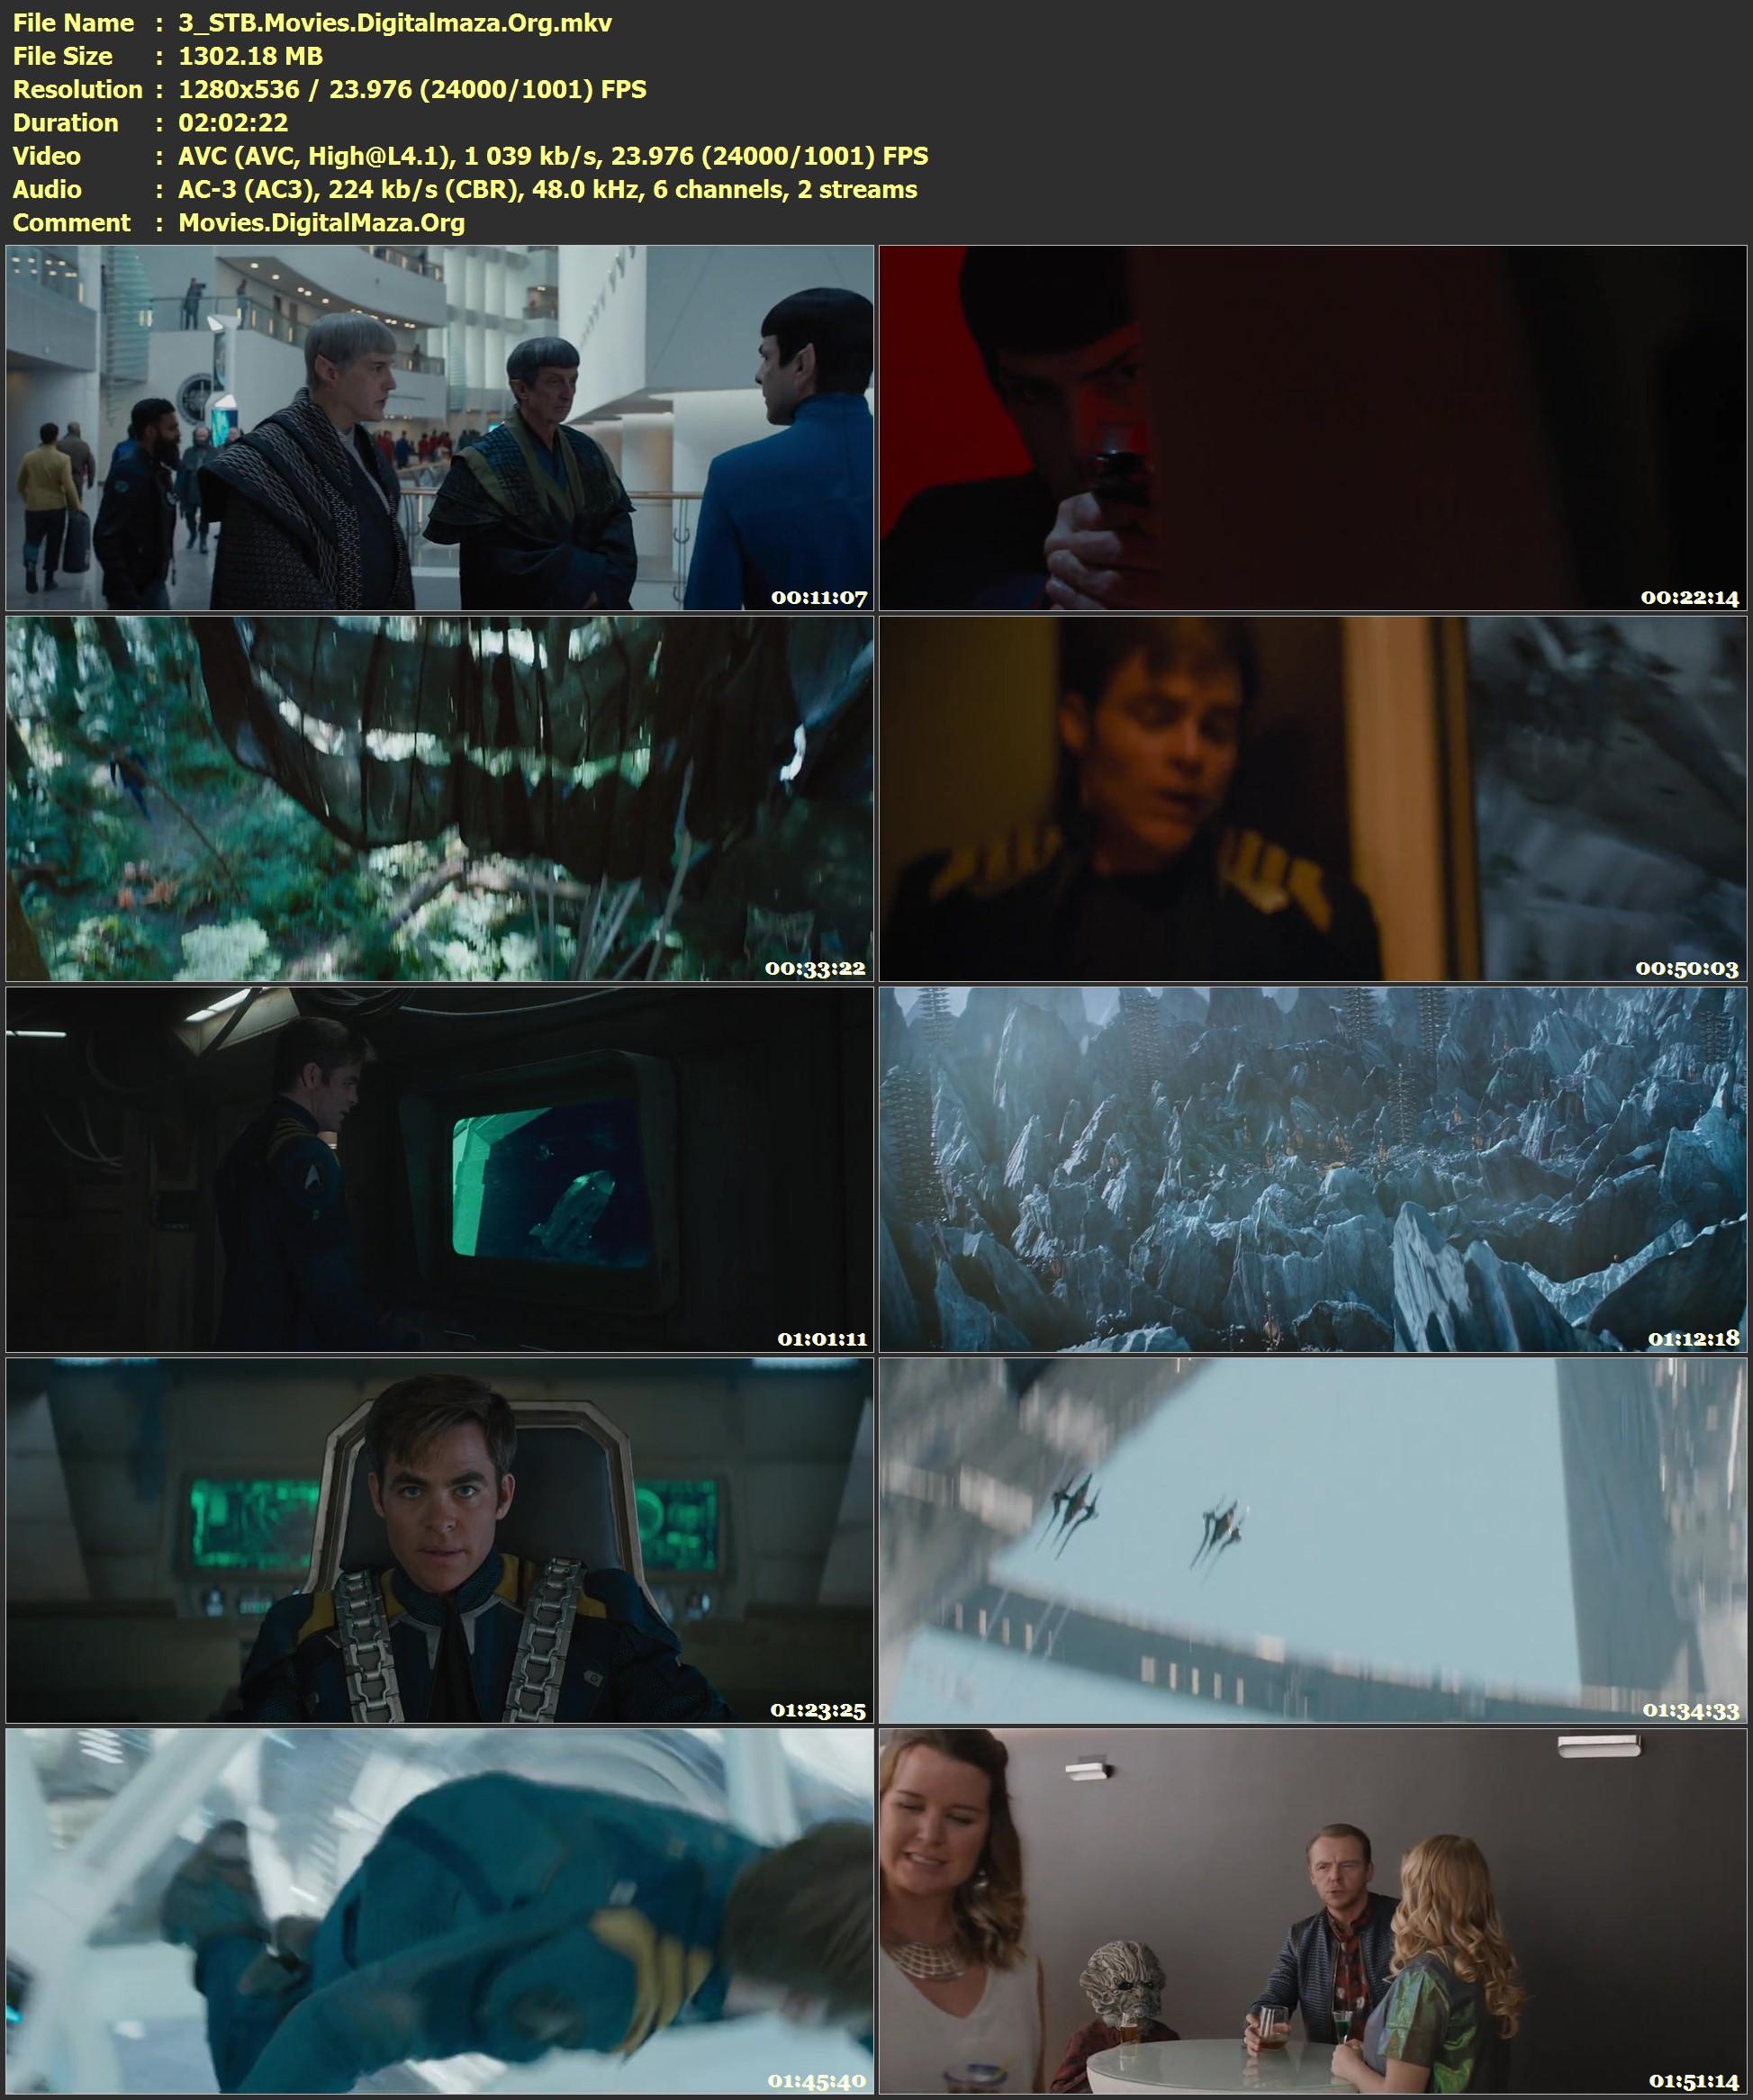 https://image.ibb.co/ed0uFx/3_STB_Movies_Digitalmaza_Org_mkv.jpg